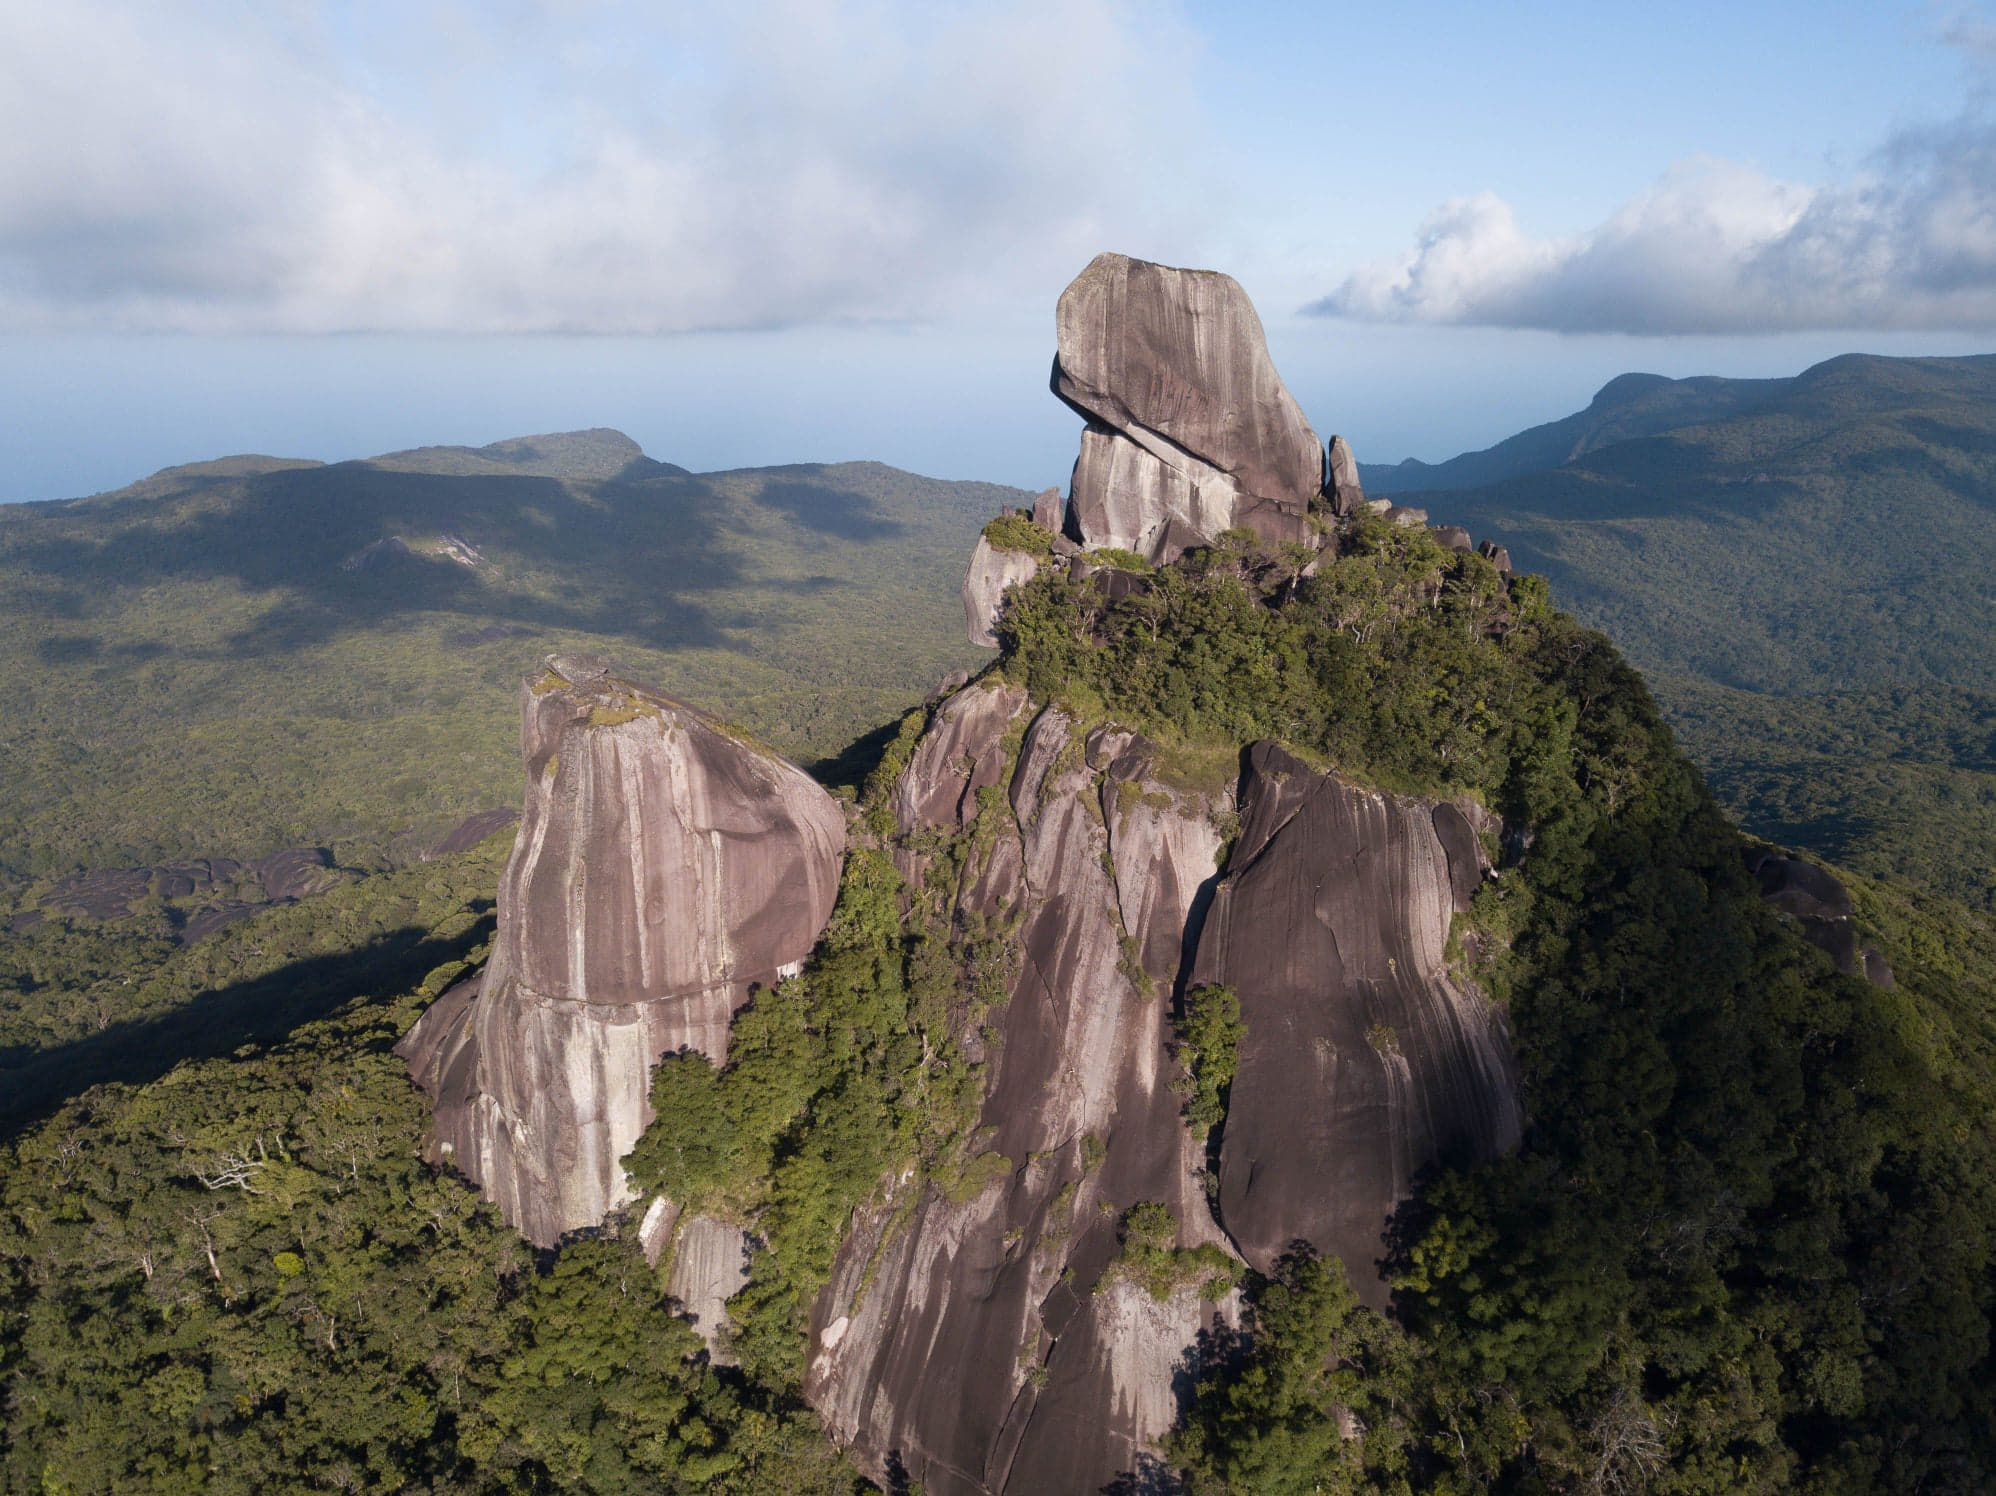 Mt Pieter Botte peaks